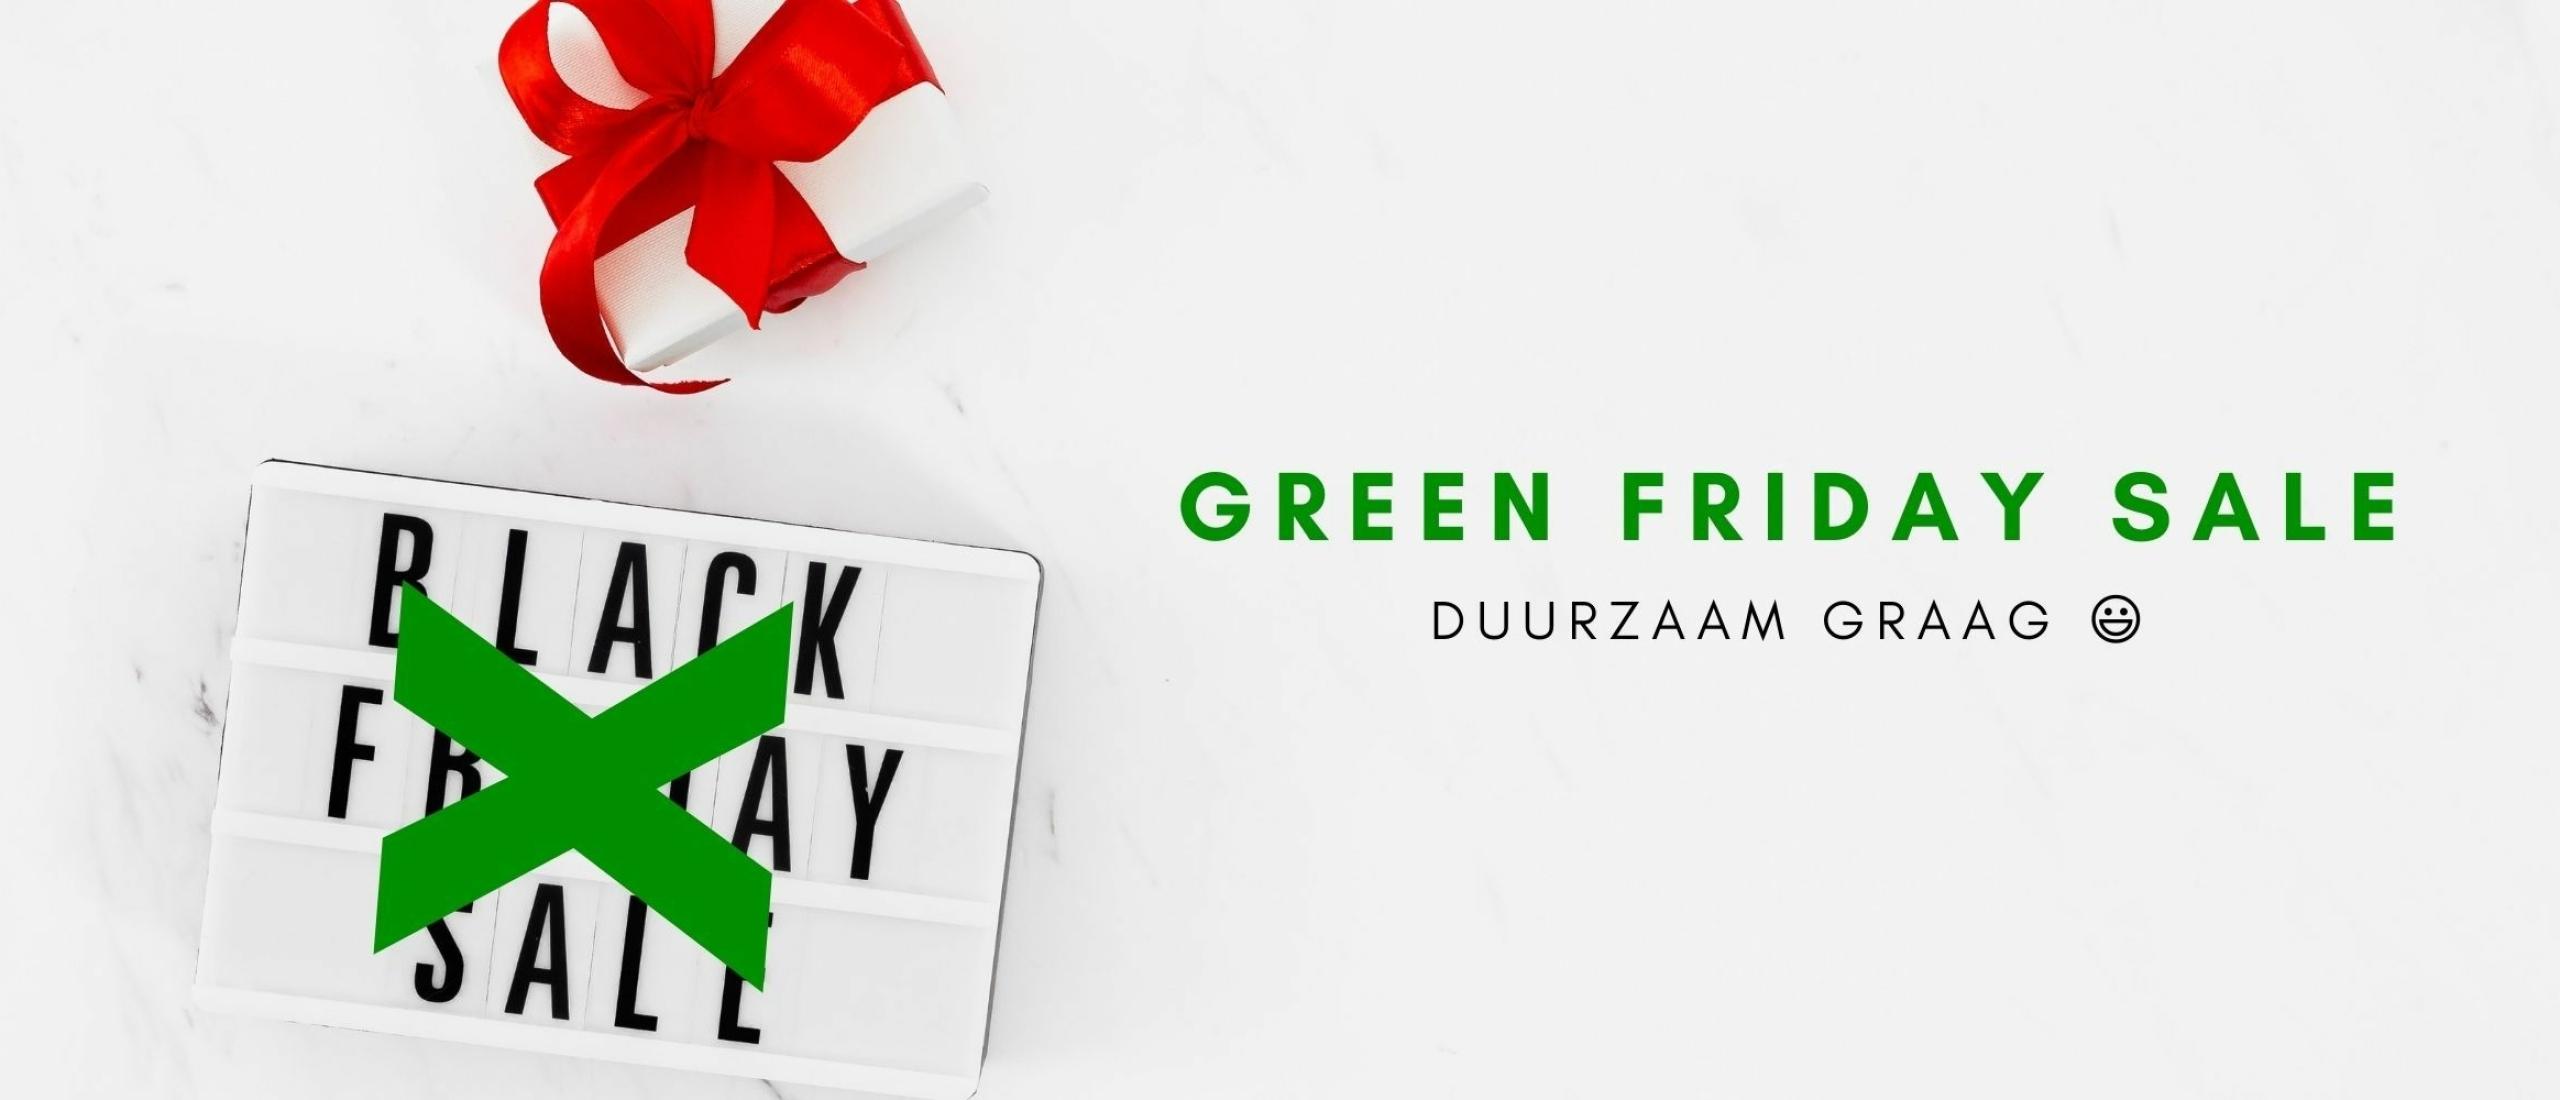 Black Friday Nederland 26 november 2021!